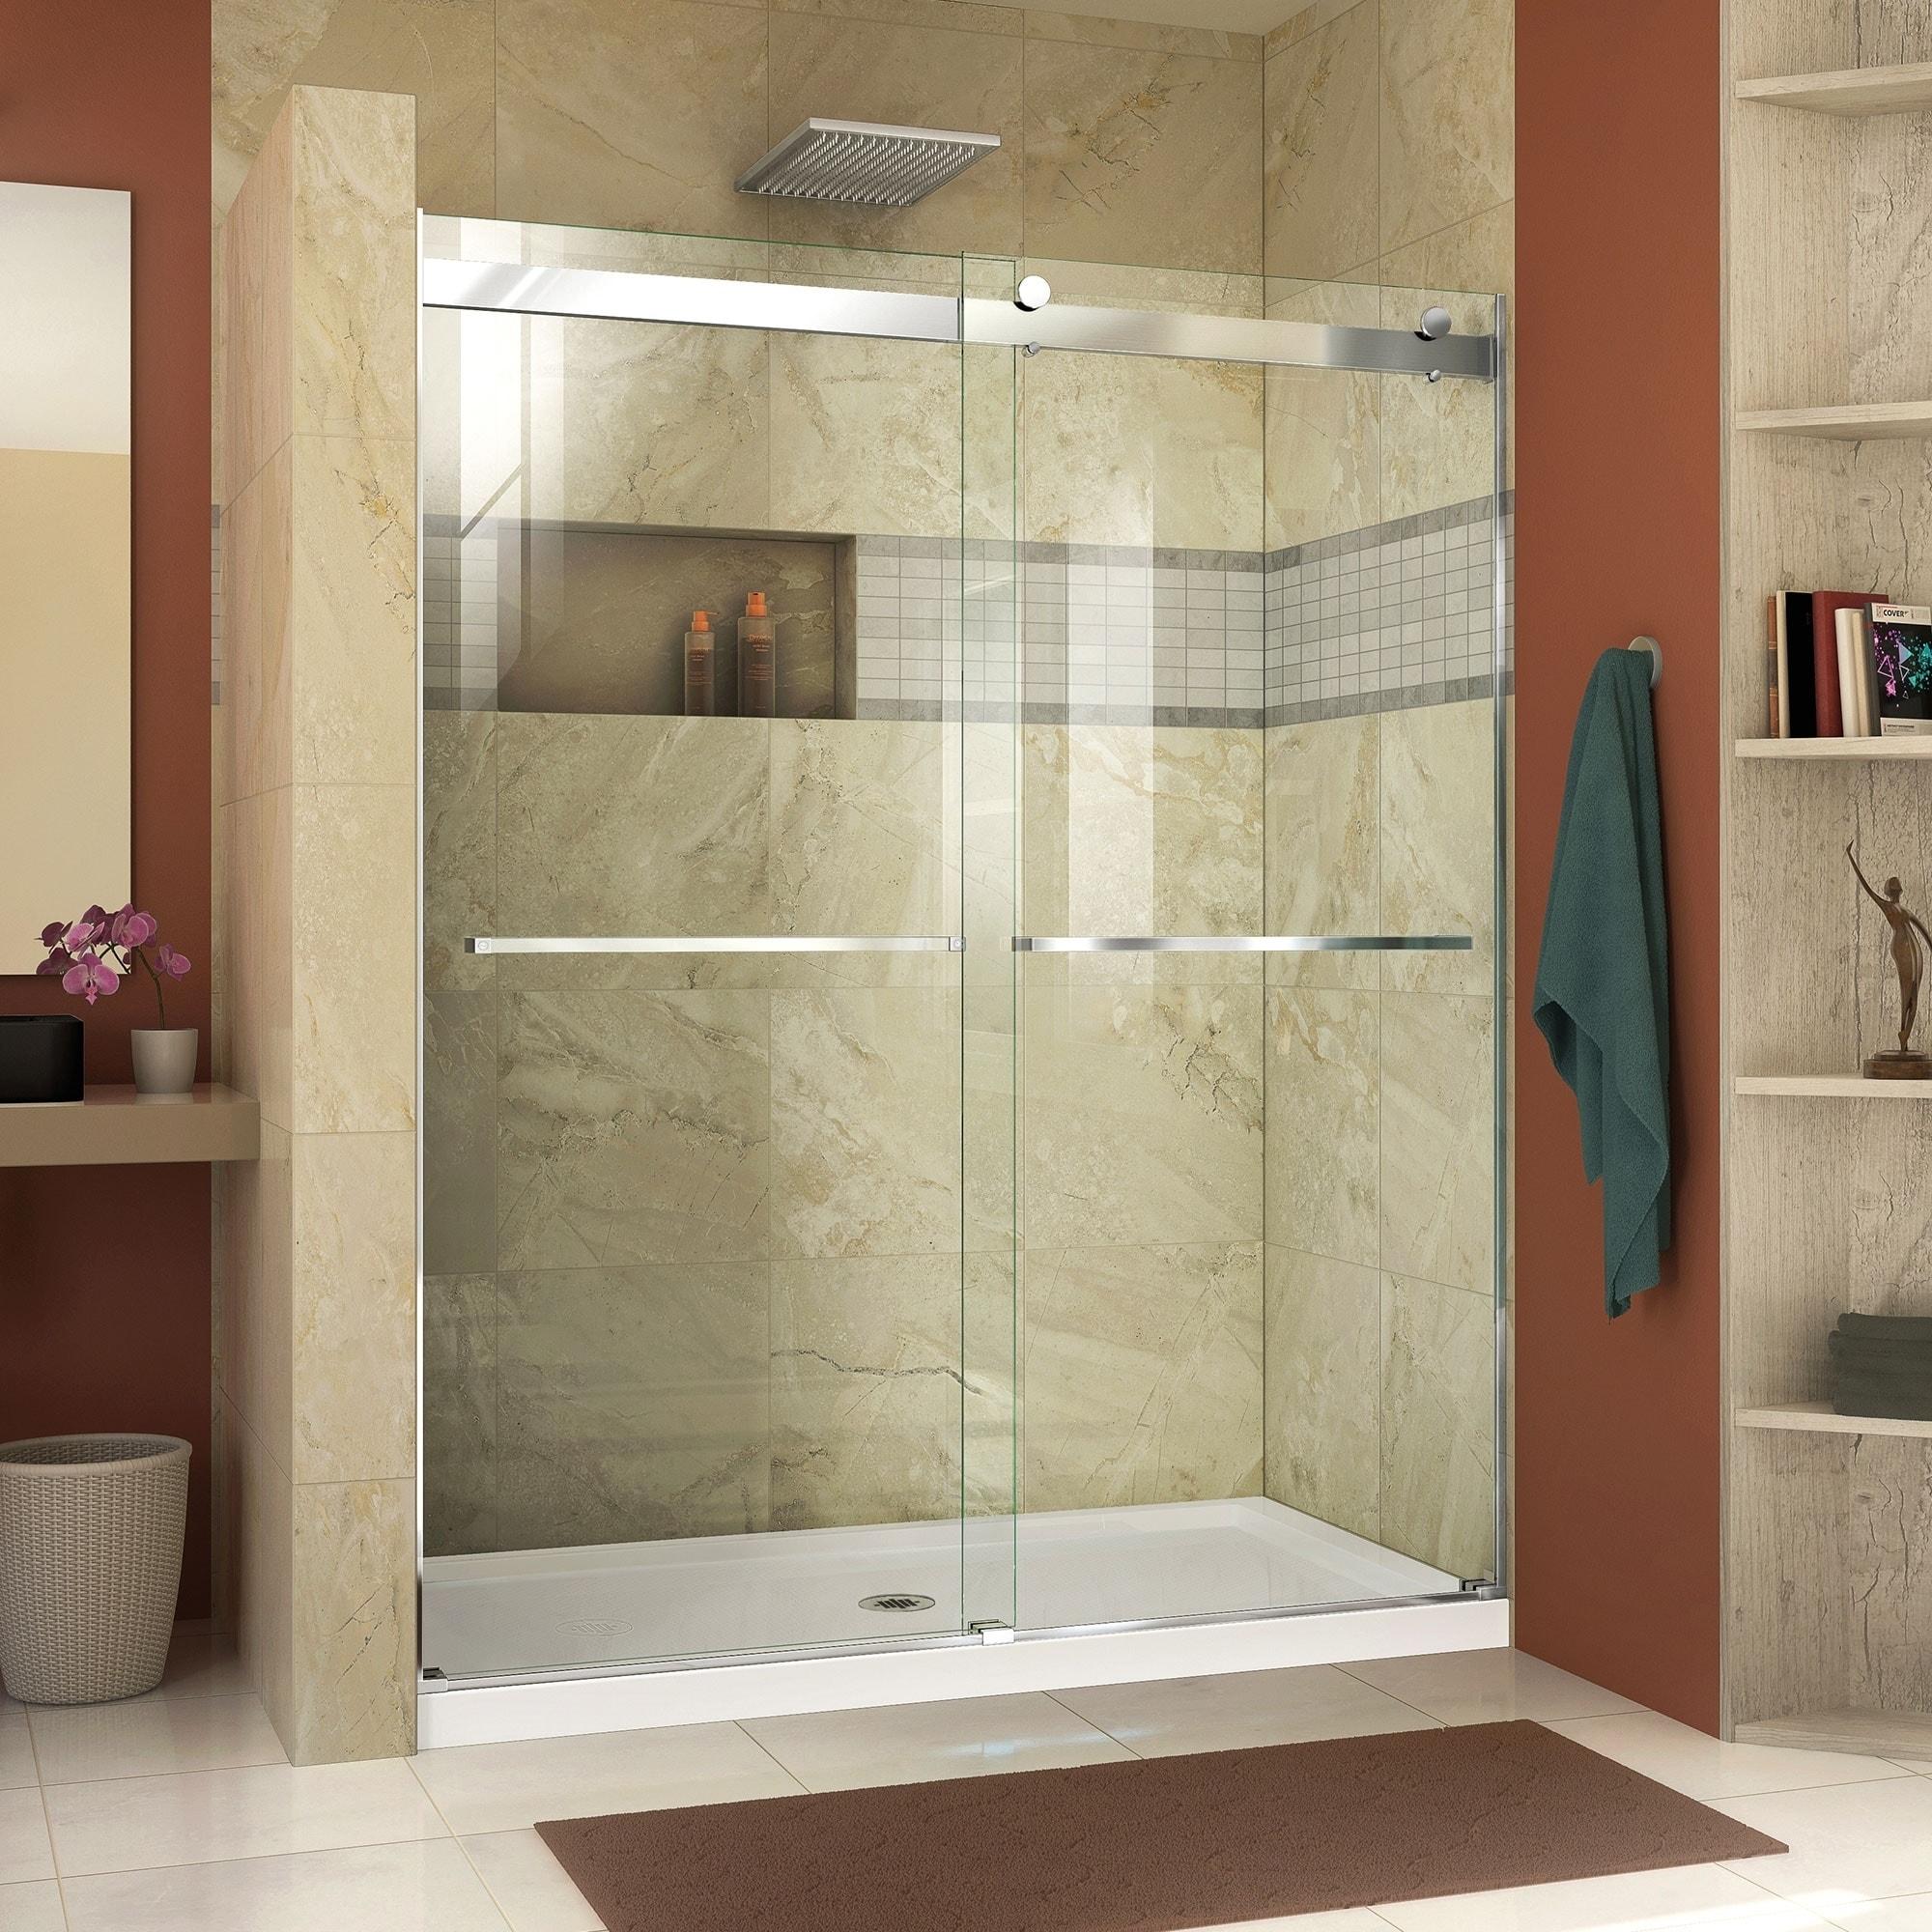 Buy Shower Stalls U0026 Kits Online At Overstock.com | Our Best Showers Deals